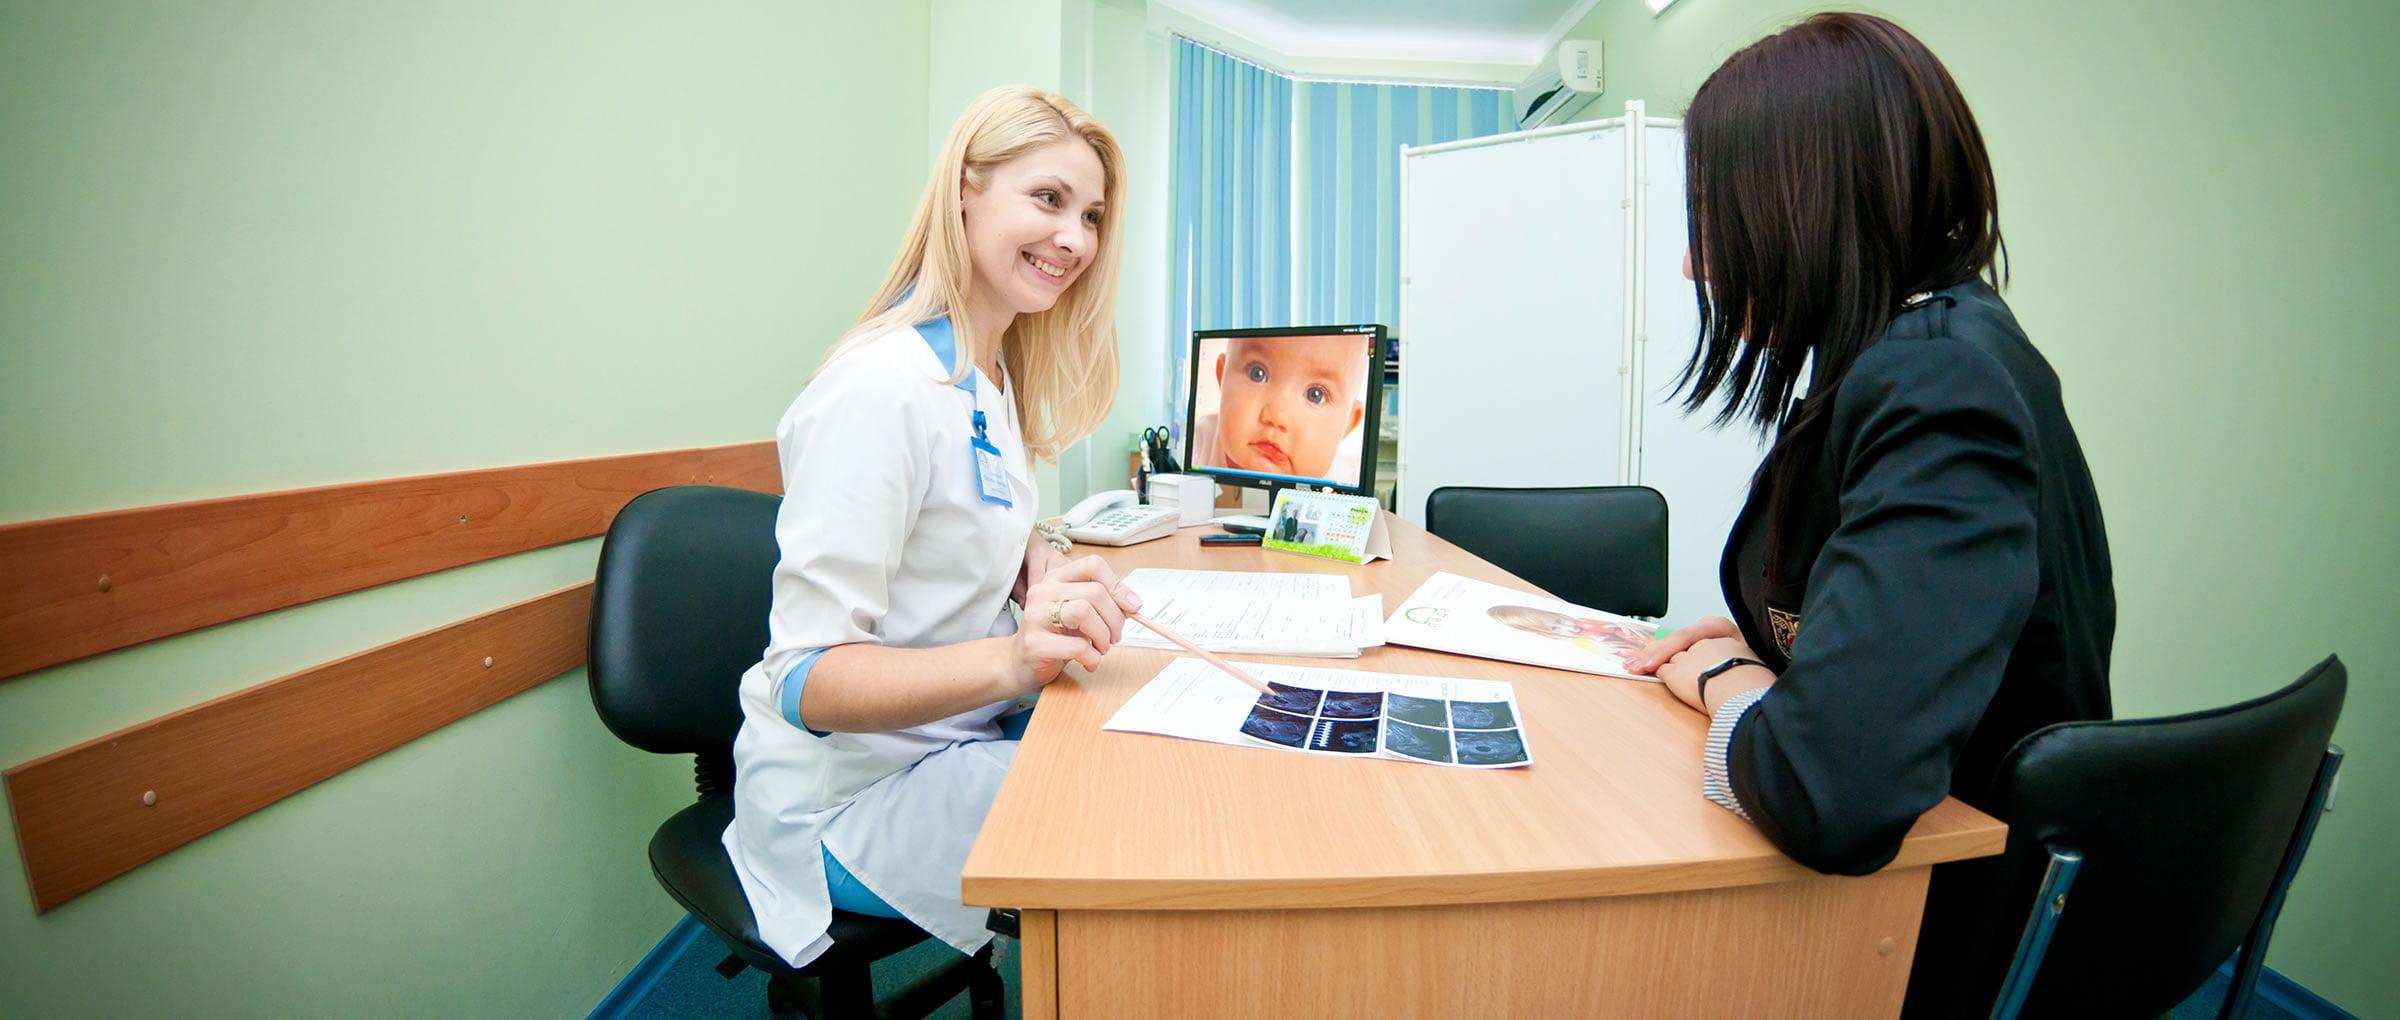 LADA reproductive center consulta médica